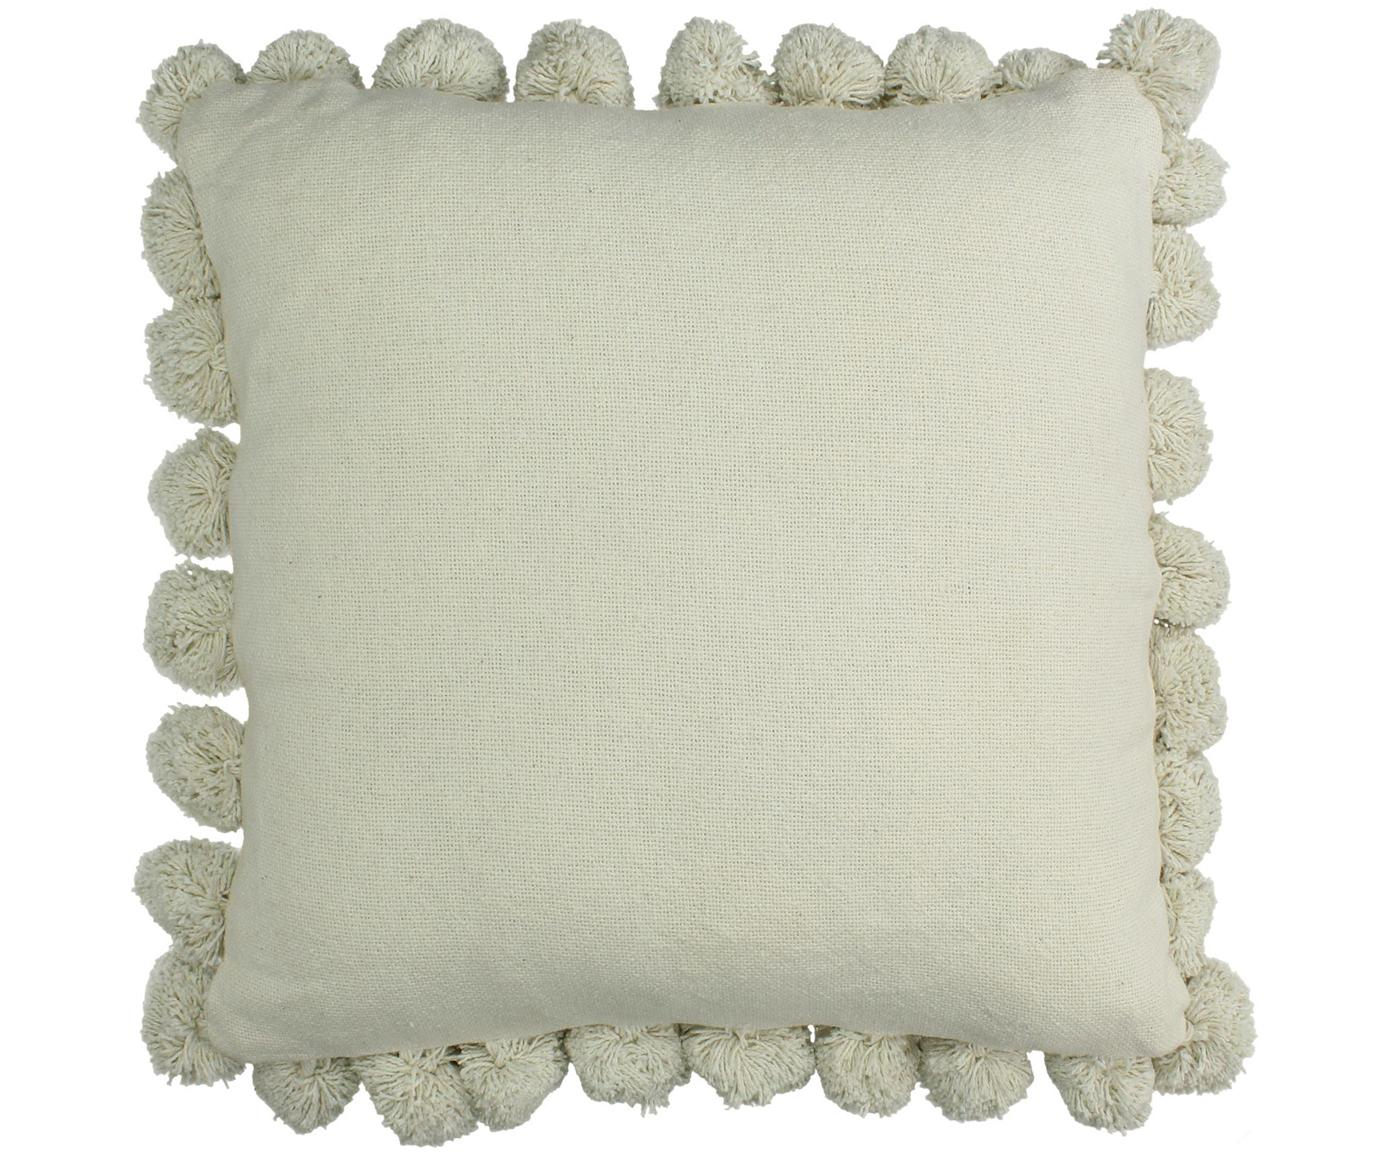 Cuscino con imbottitura e pompon Betta, Avorio, Larg. 45 x Lung. 45 cm